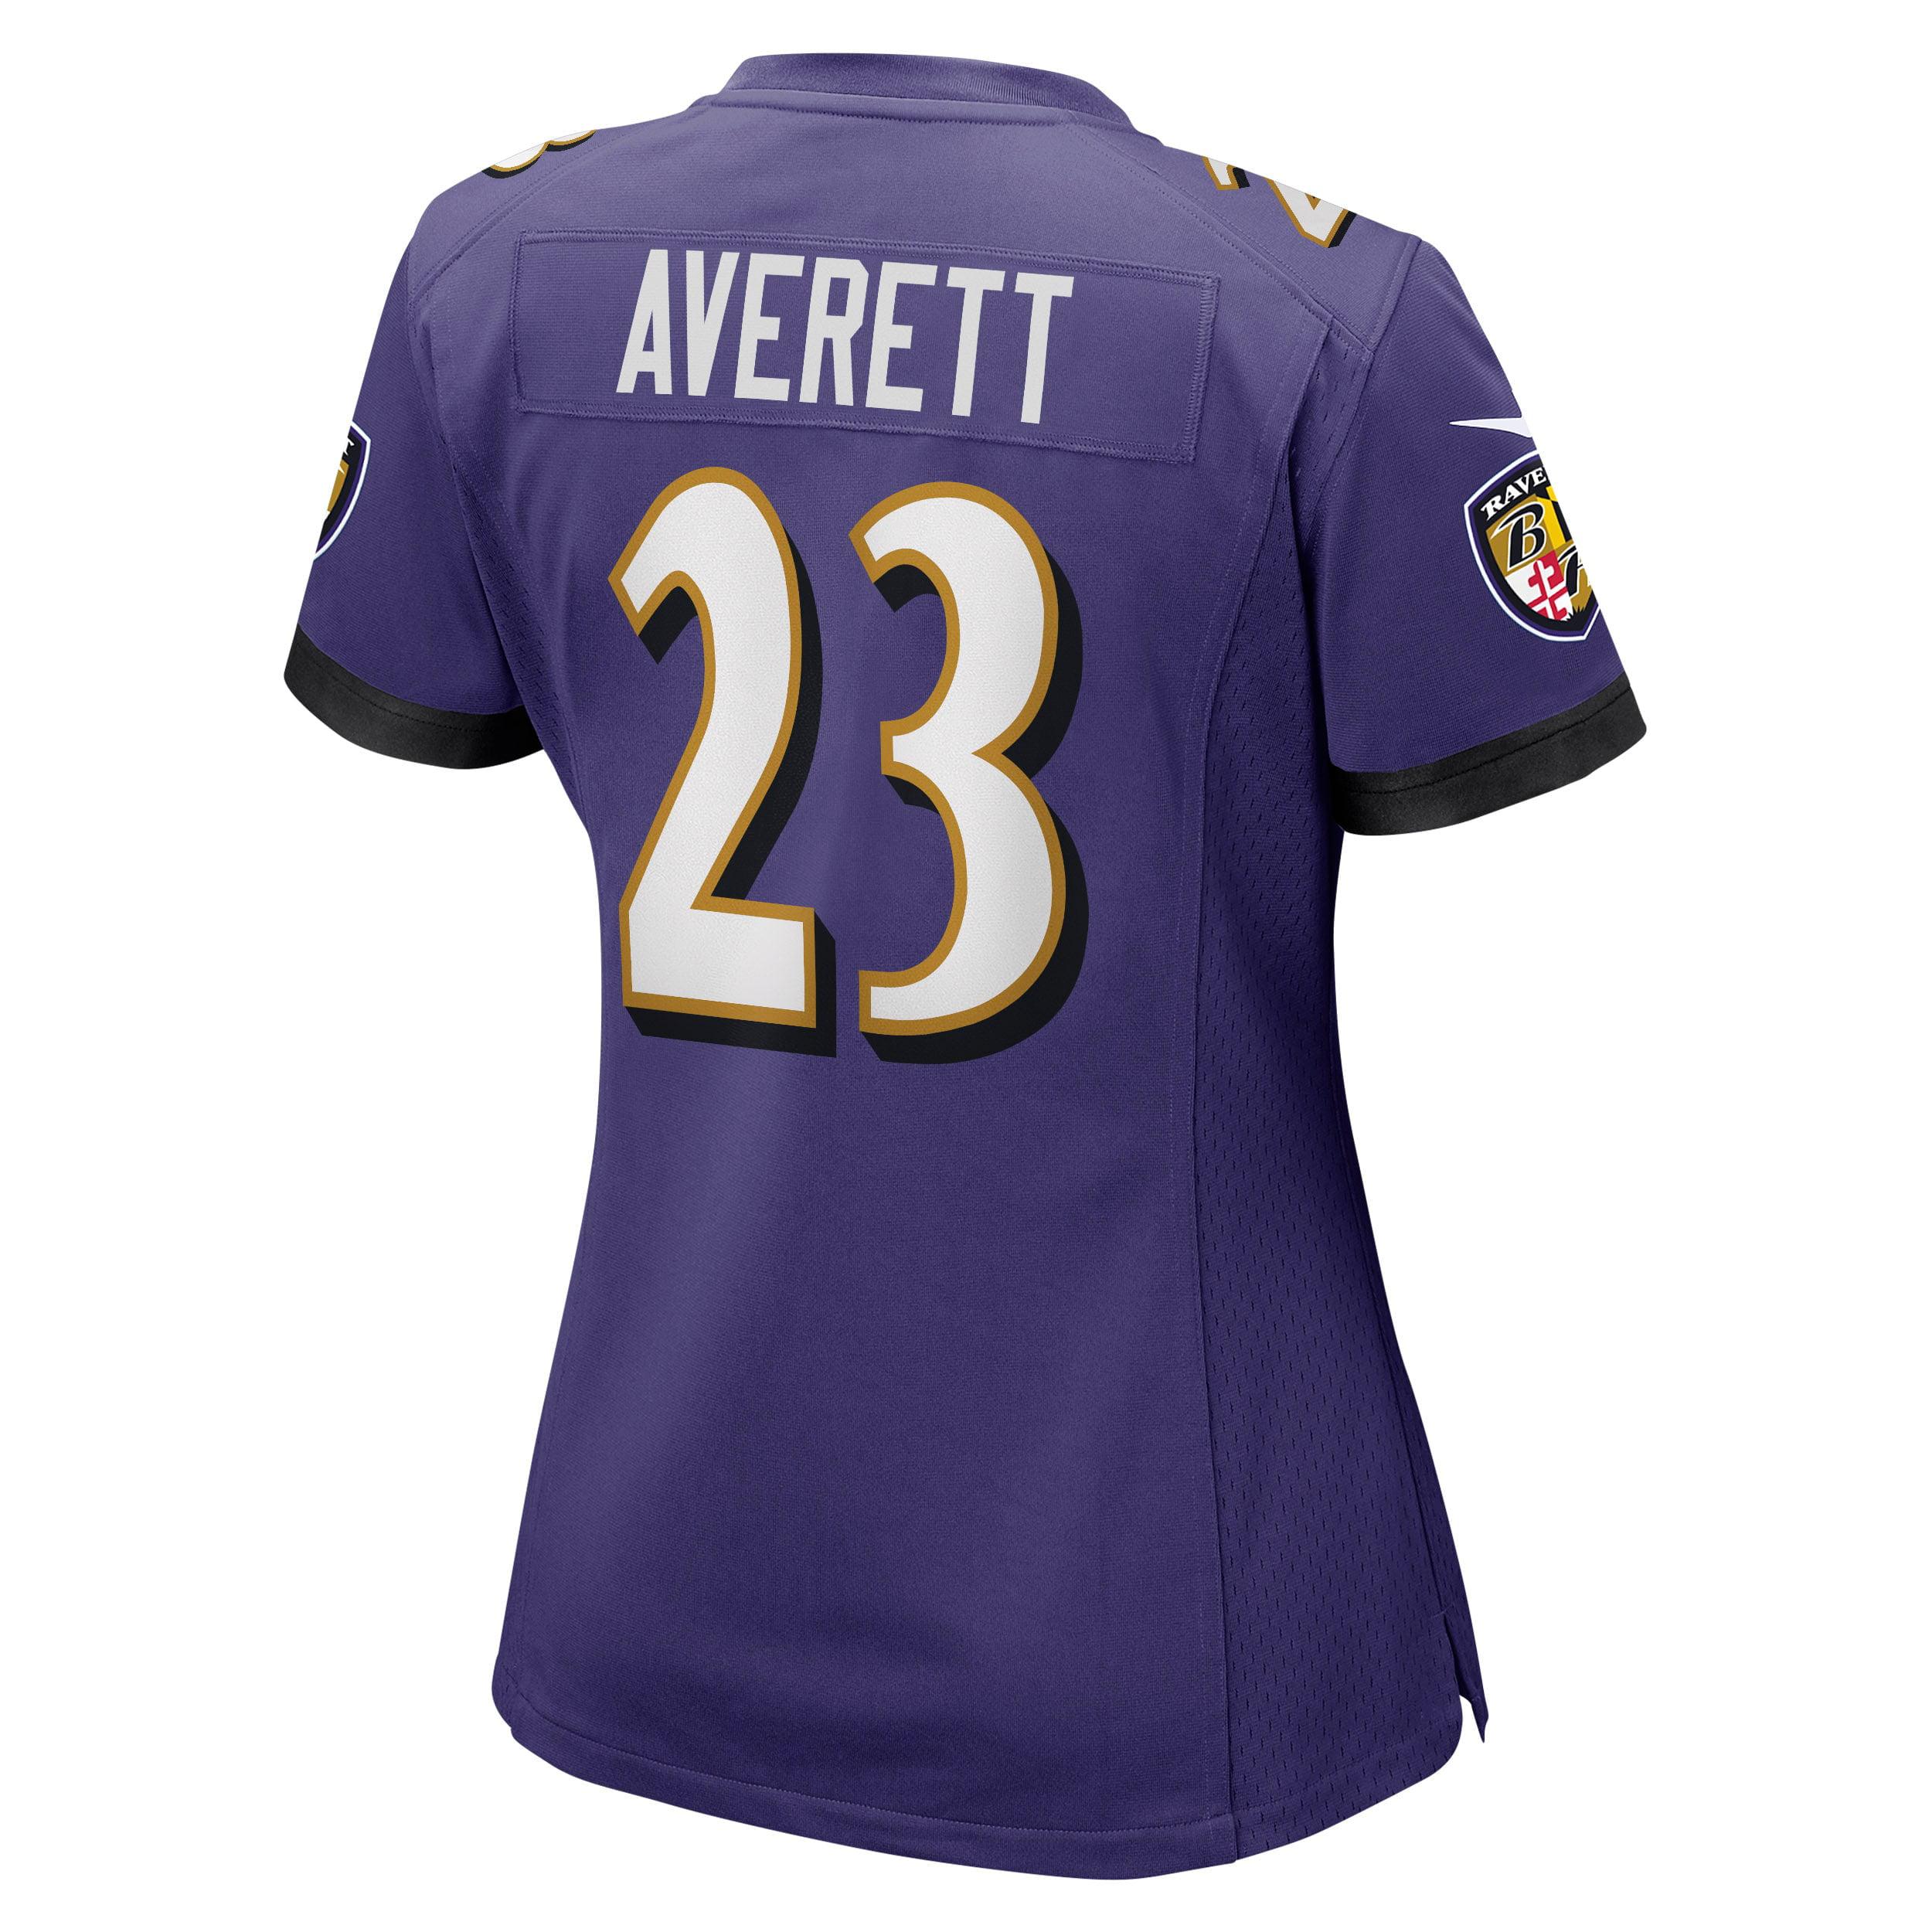 Anthony Averett Jersey